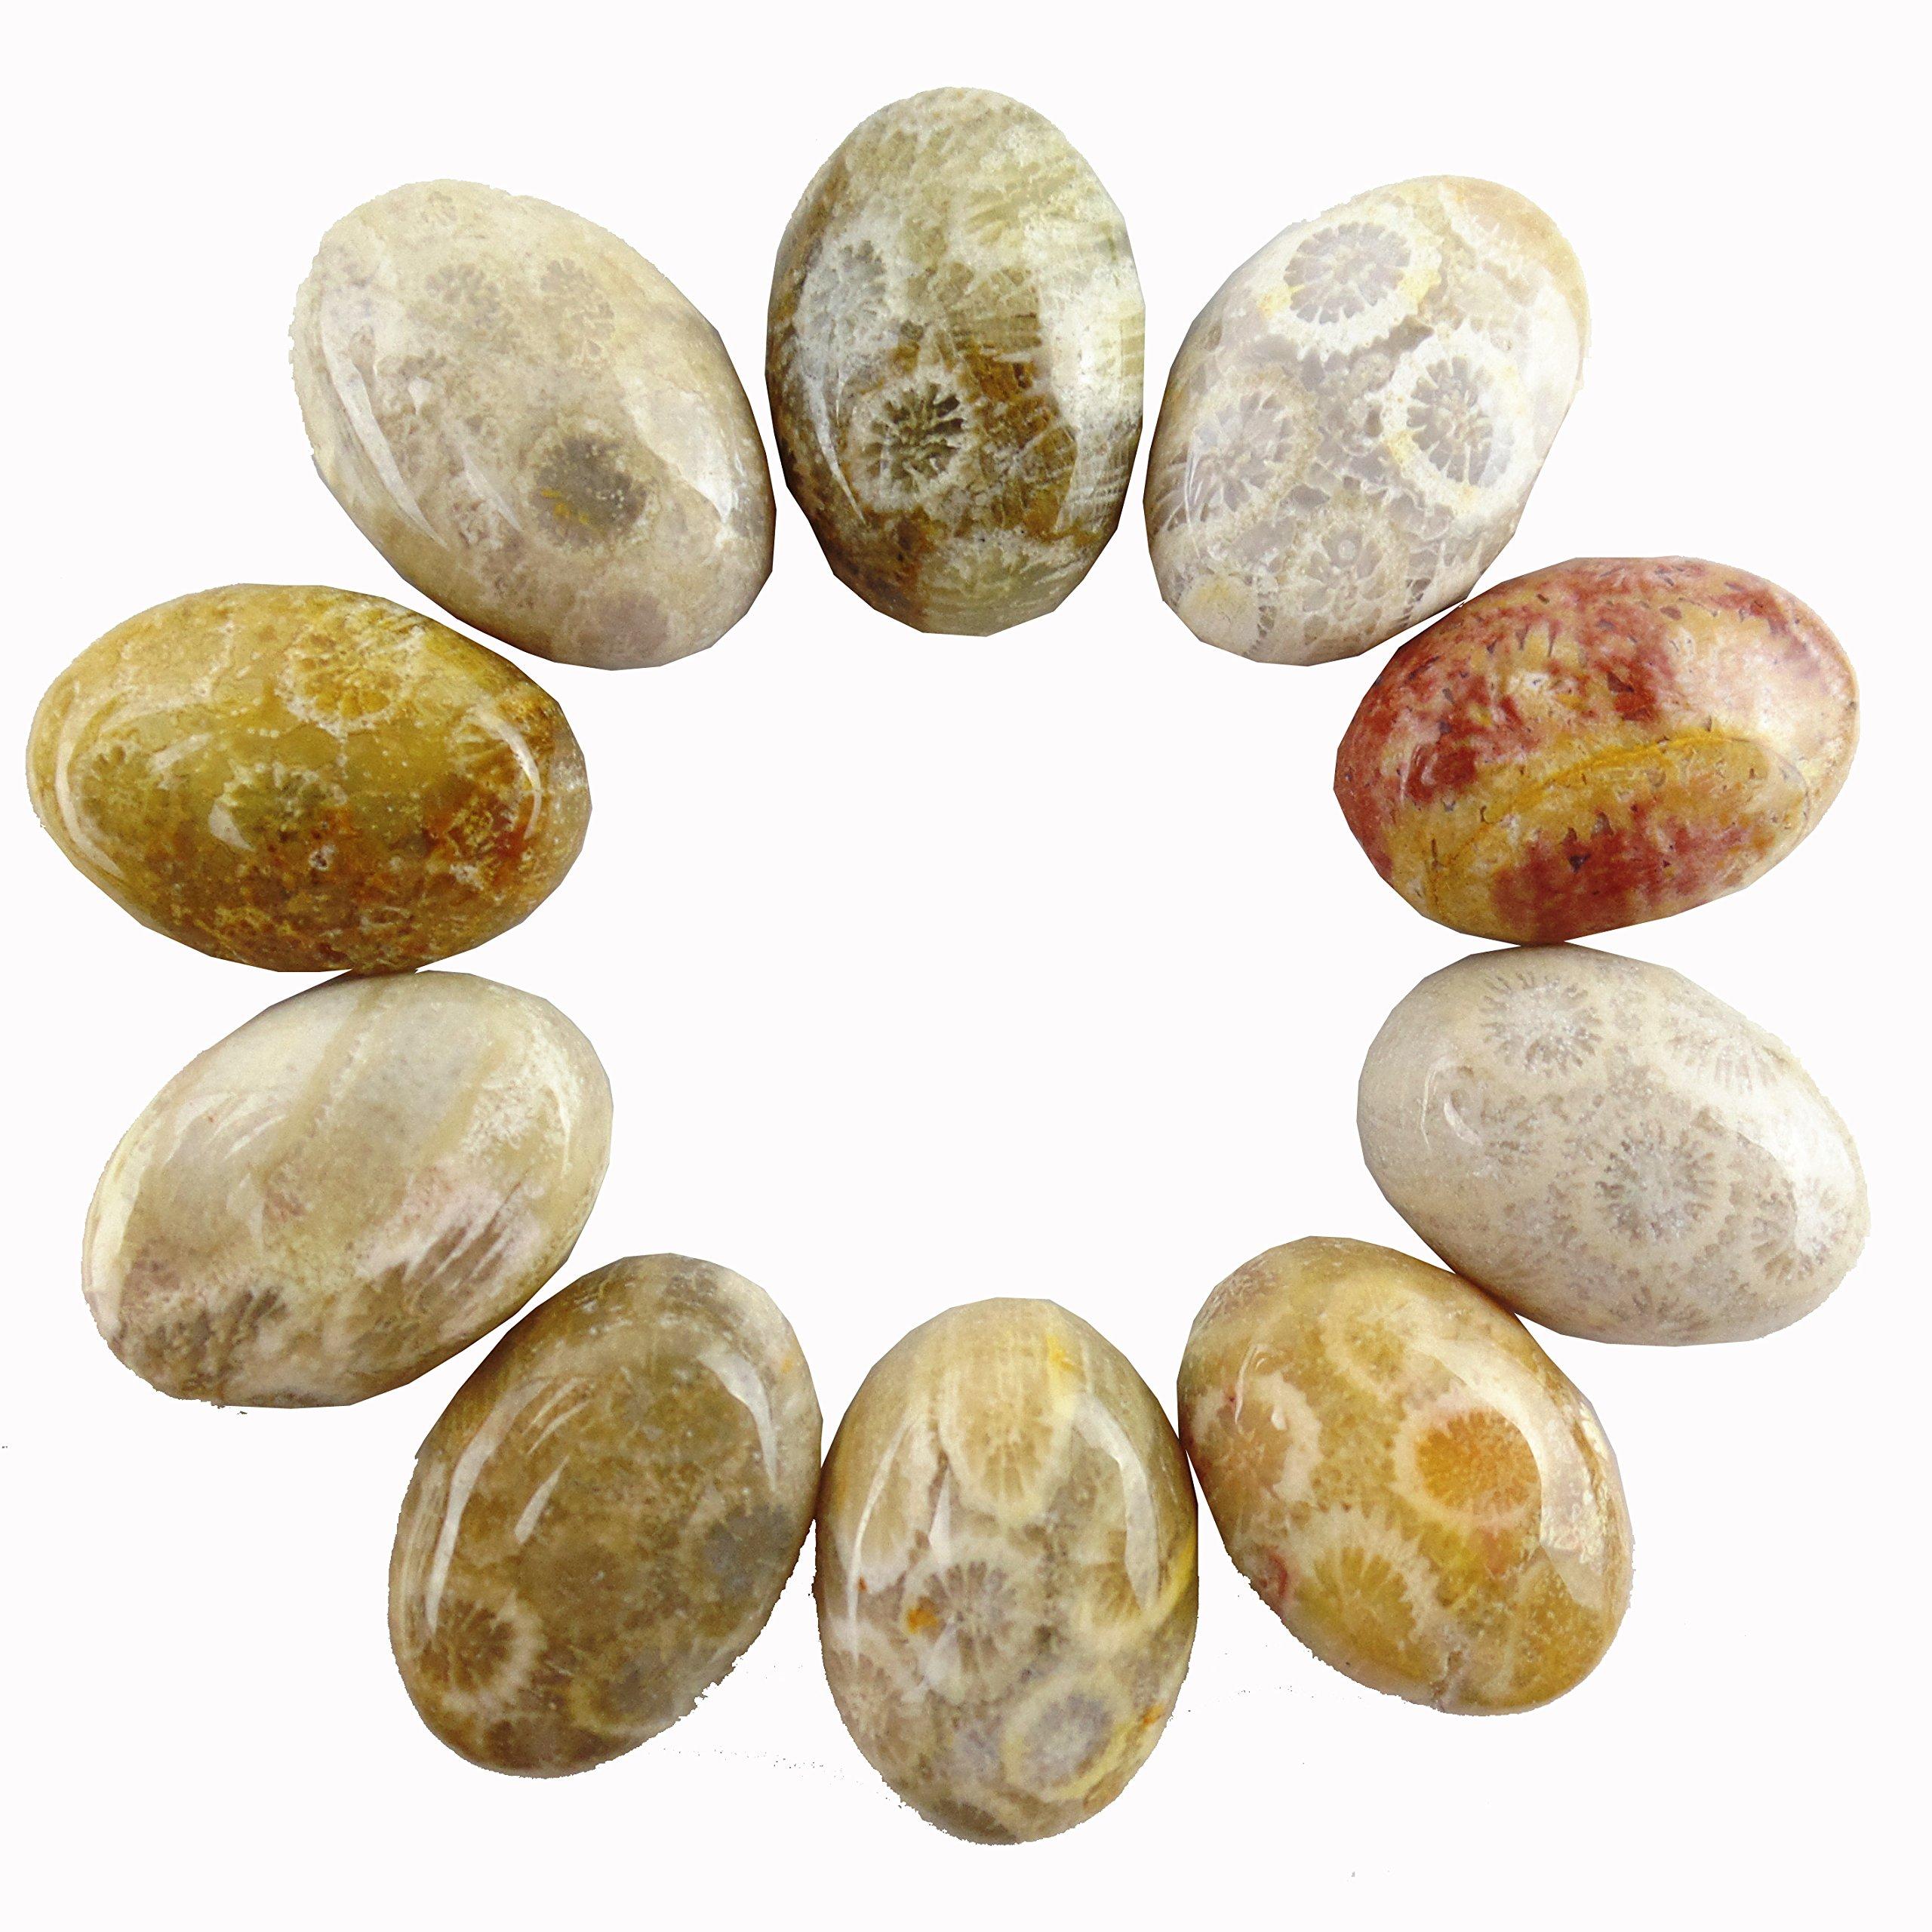 JCGJ Semi Precious Stones,Healing Natural Coral Fossil Oval Cab Cabochon for Jewelry Making(18x13x6mm,10pcs)